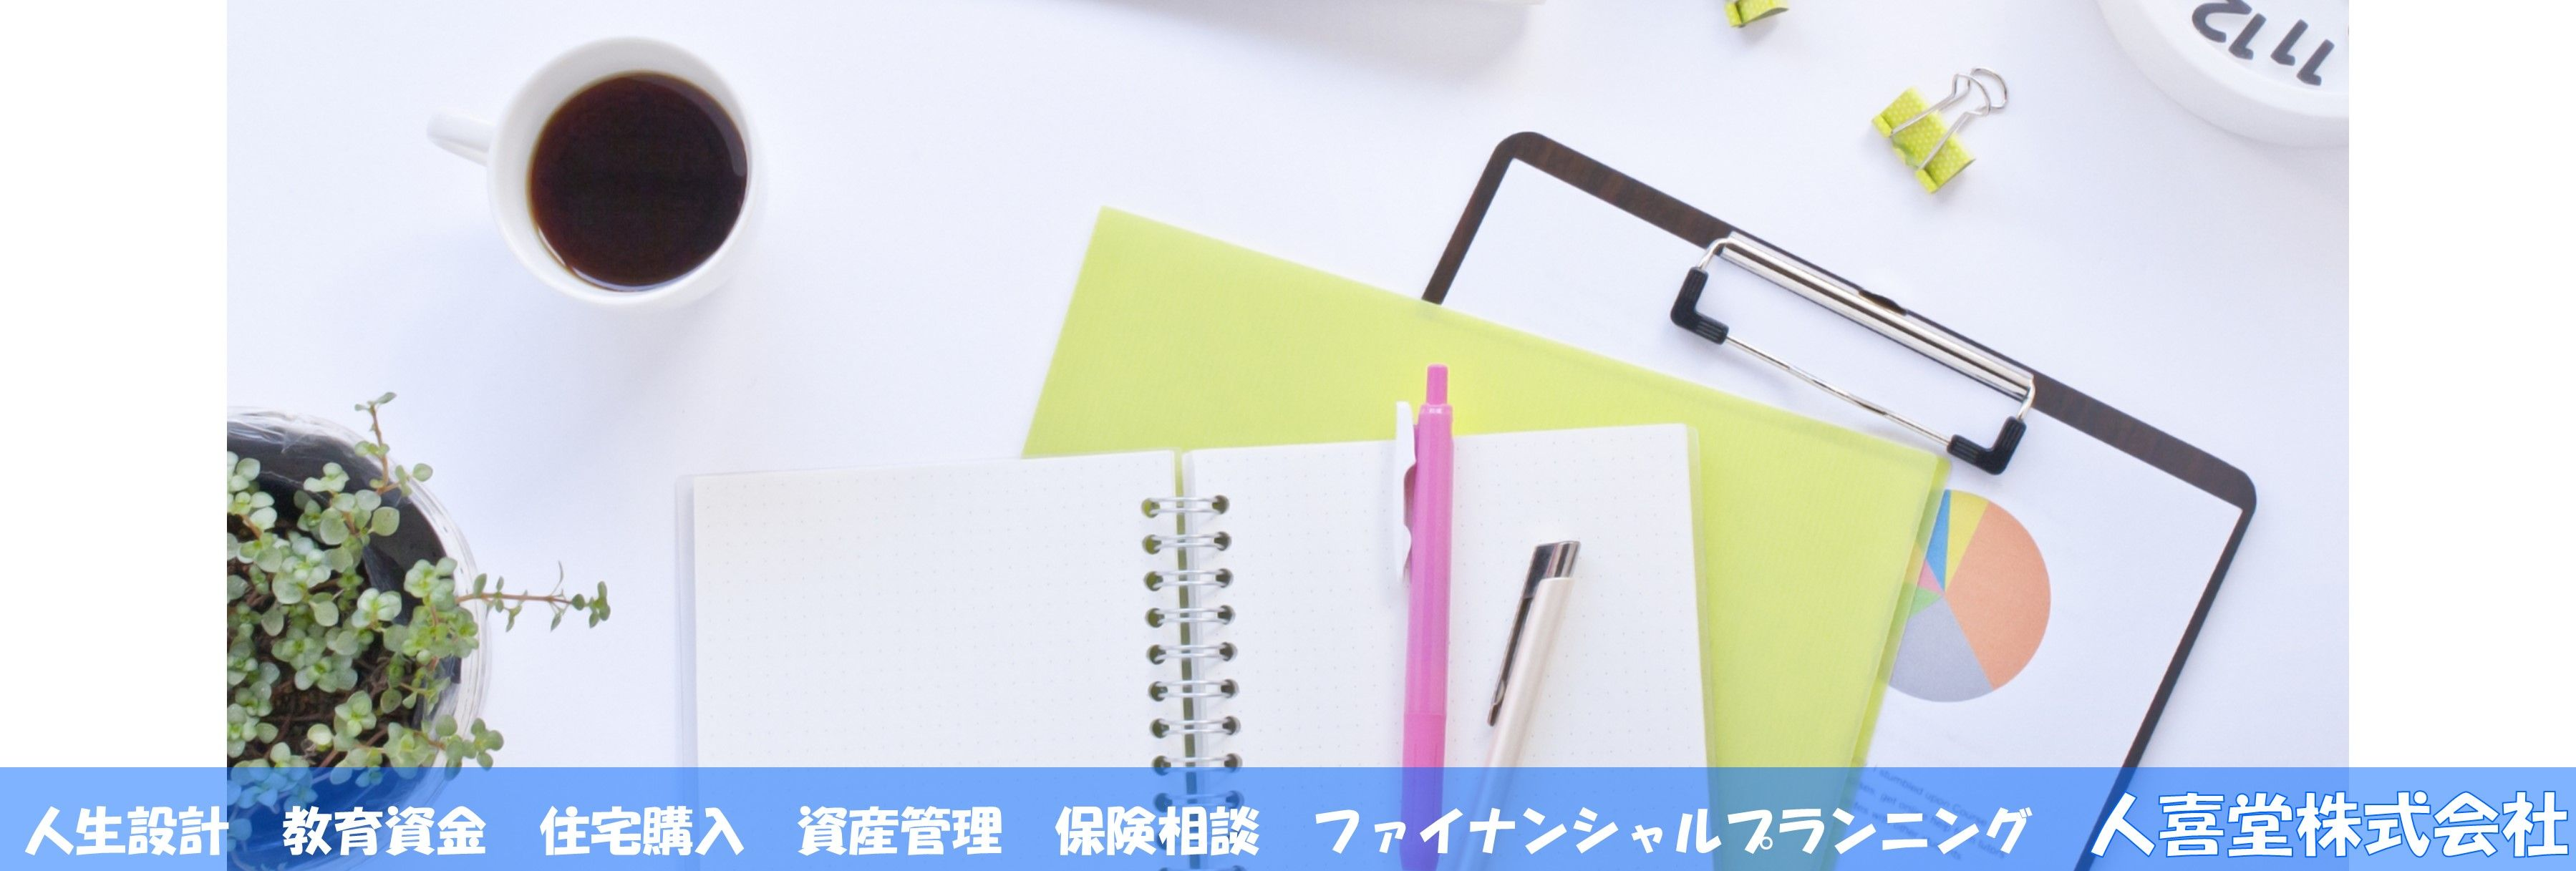 人喜堂株式会社 NINKIDO.CO